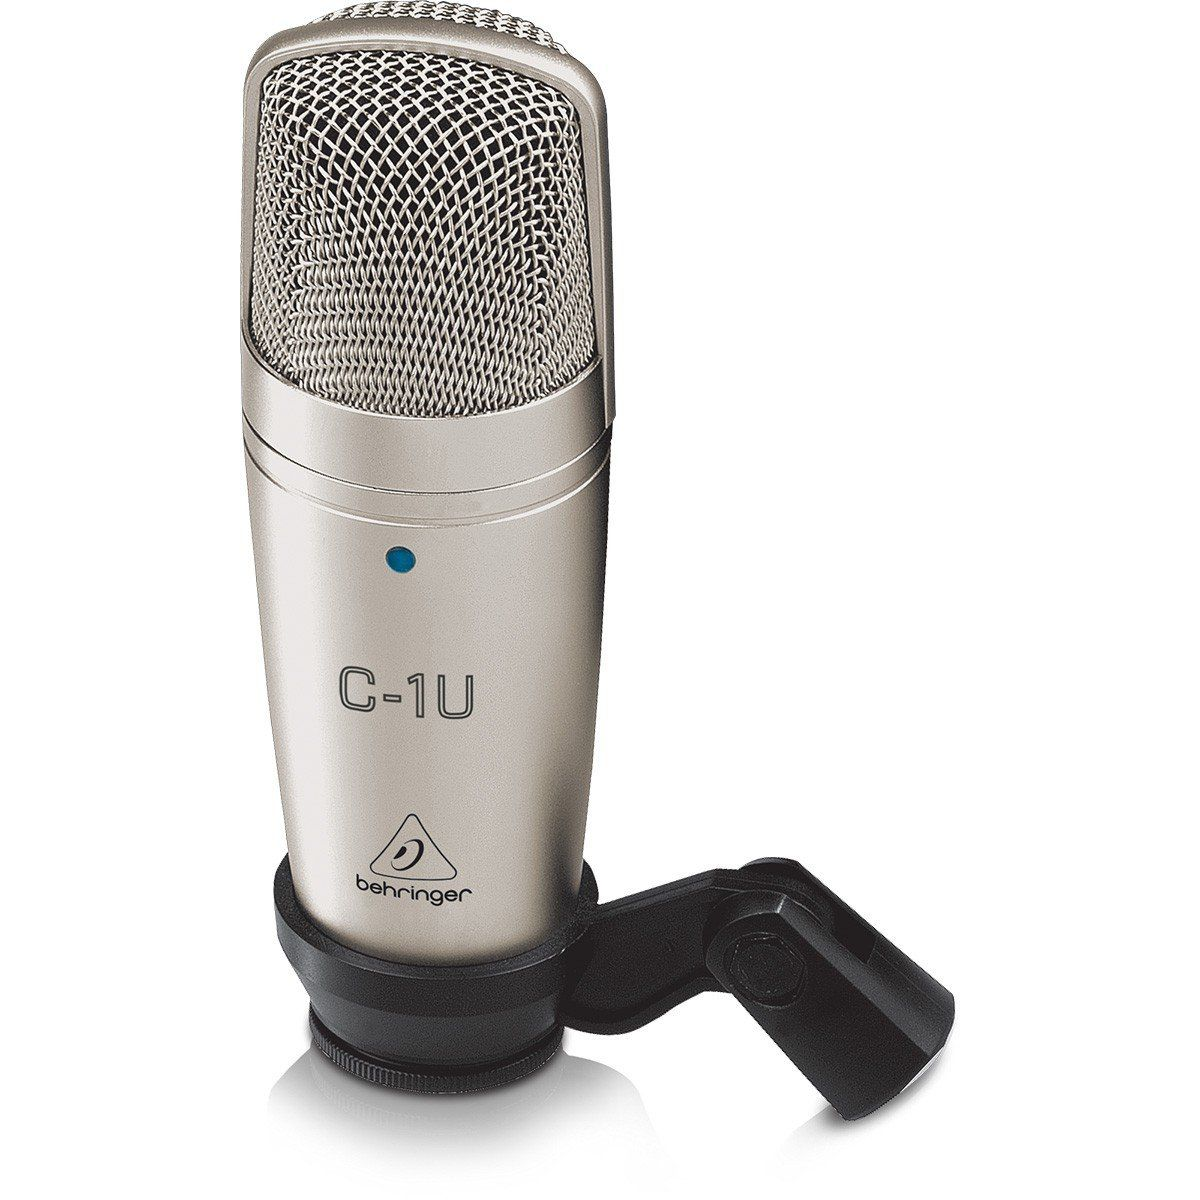 Behringer C1U Microfone USB Condensador Behringer-C1U para Gravações